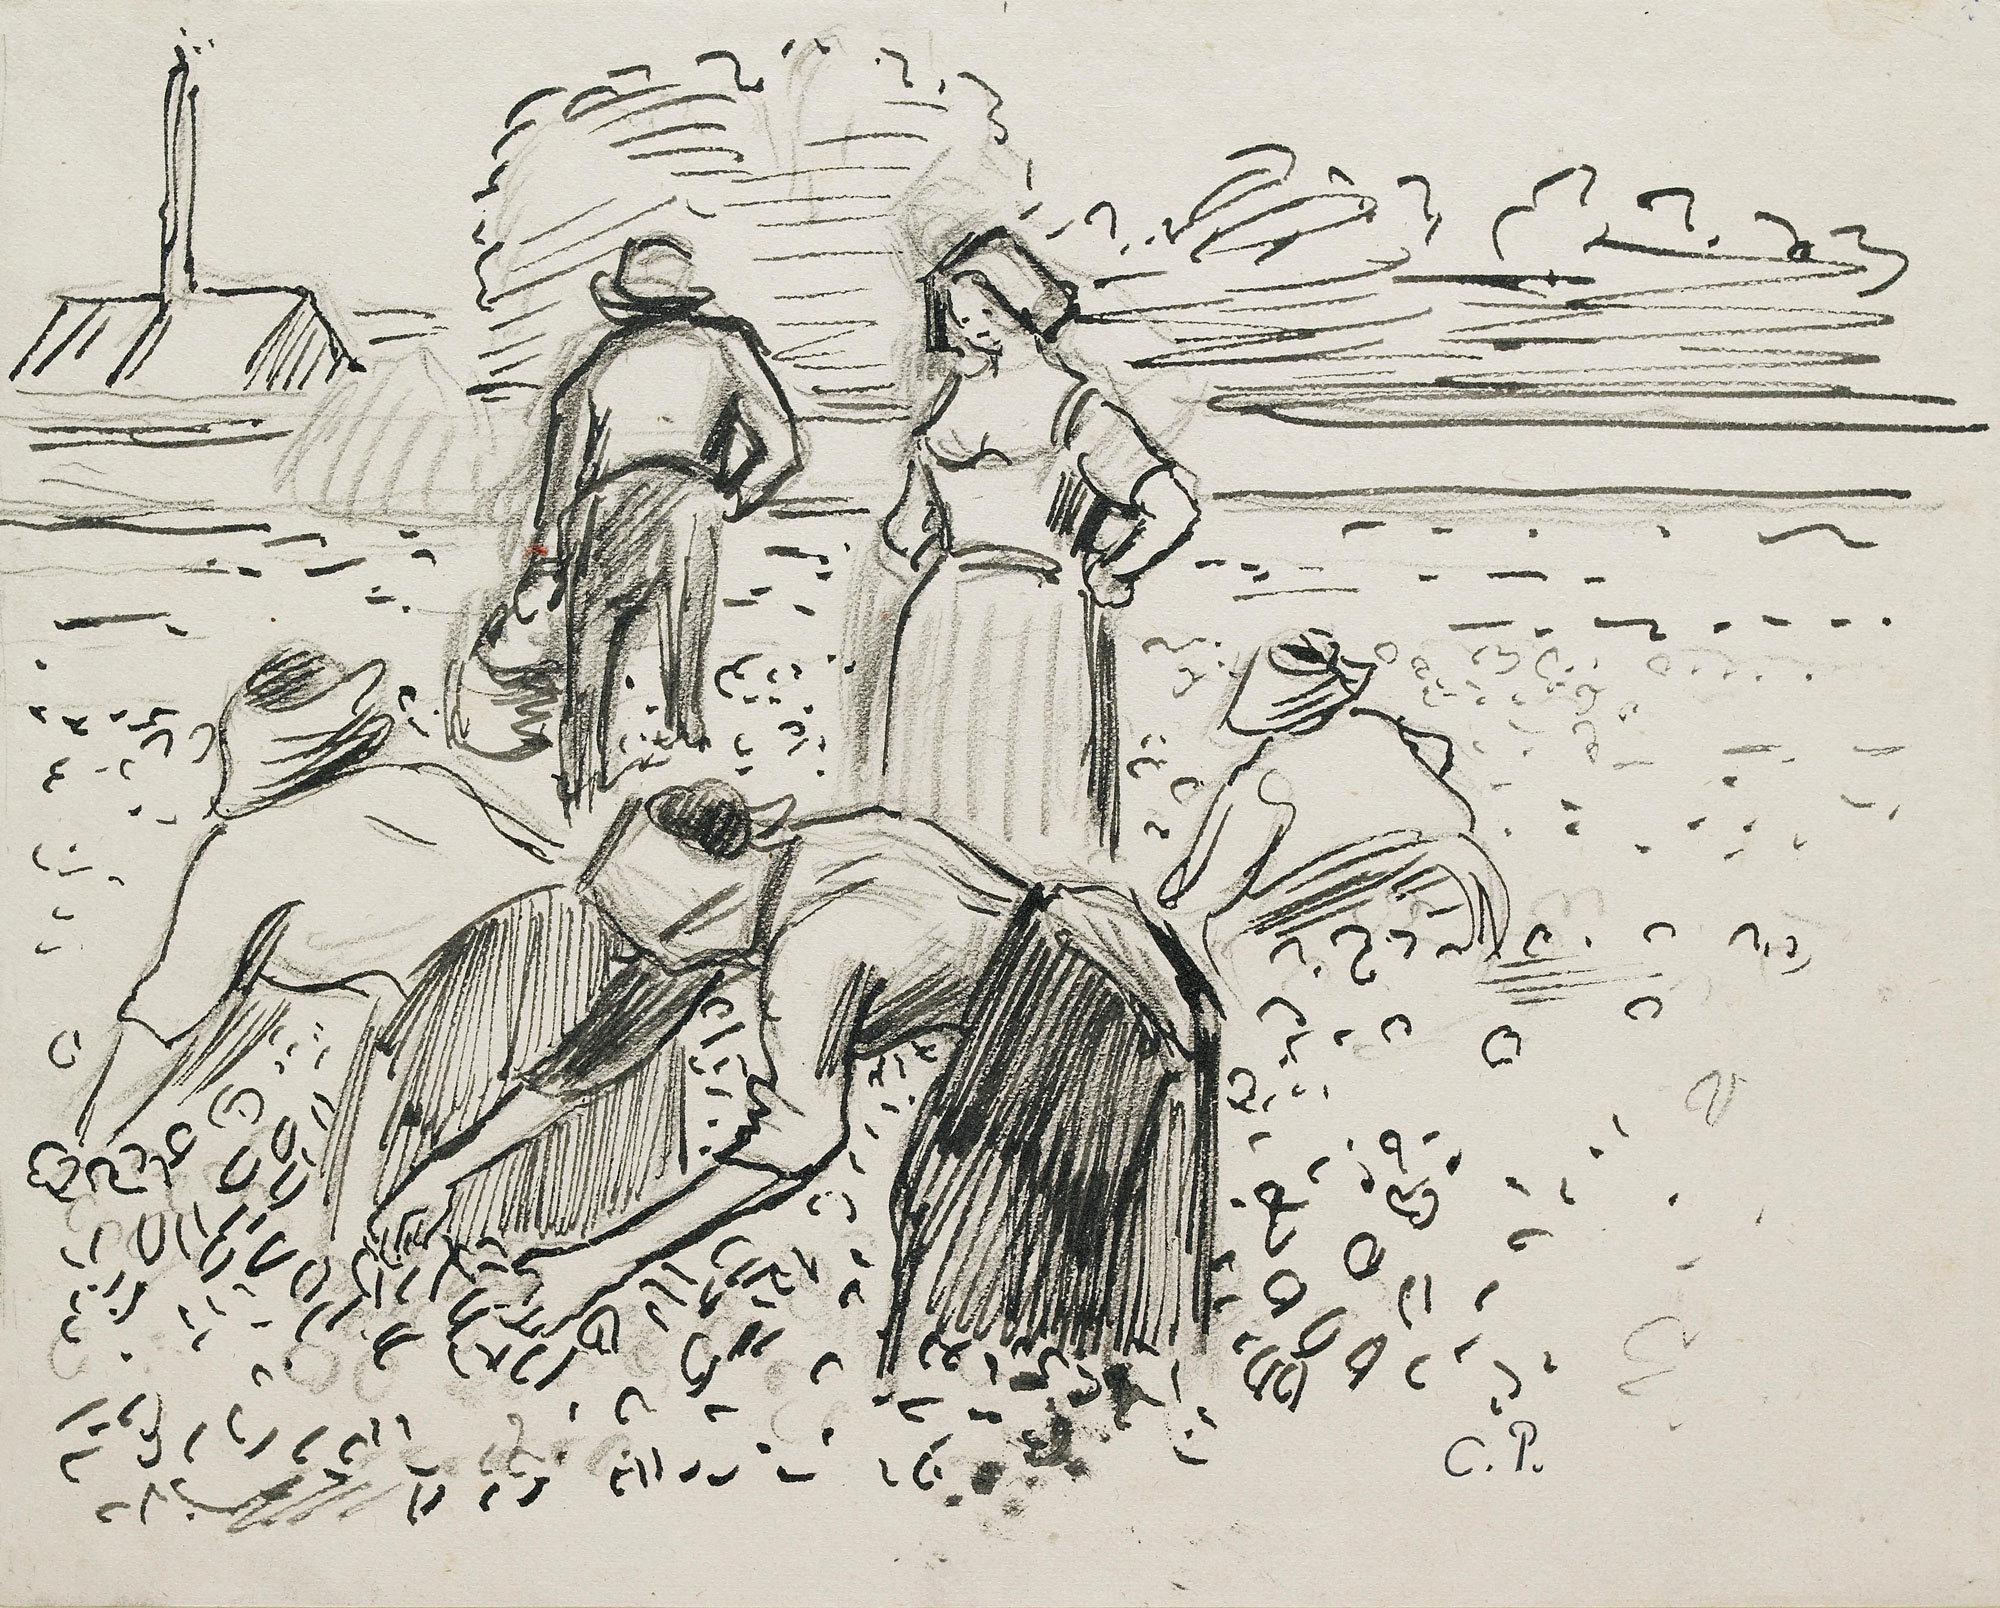 Camille Pissarro - Study of five peasant figures working in a field, 1887, Bilderrahmen weiß